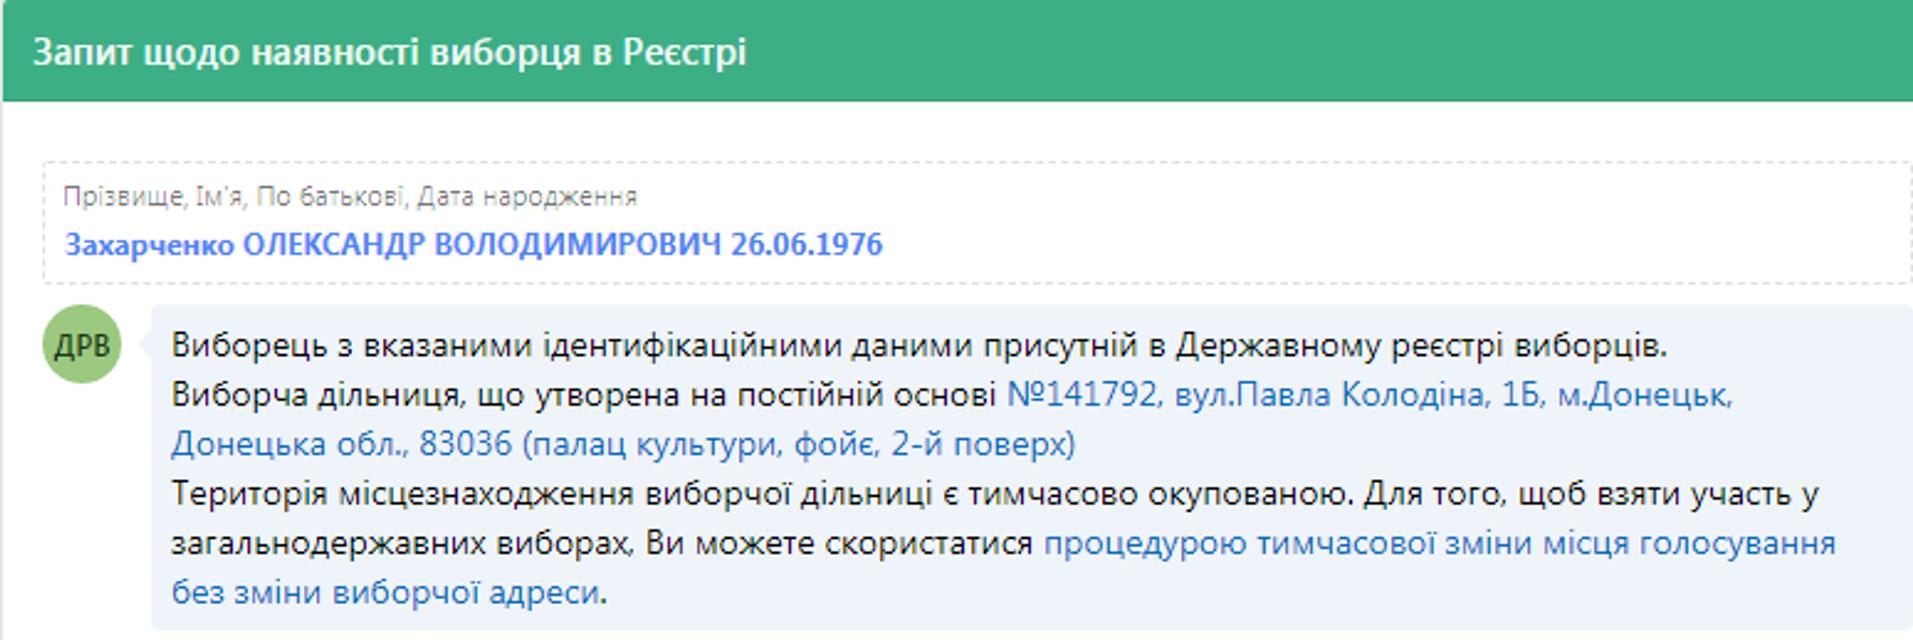 Гиви и Захарченко проголосуют на выборах: фотофакт - фото 177559